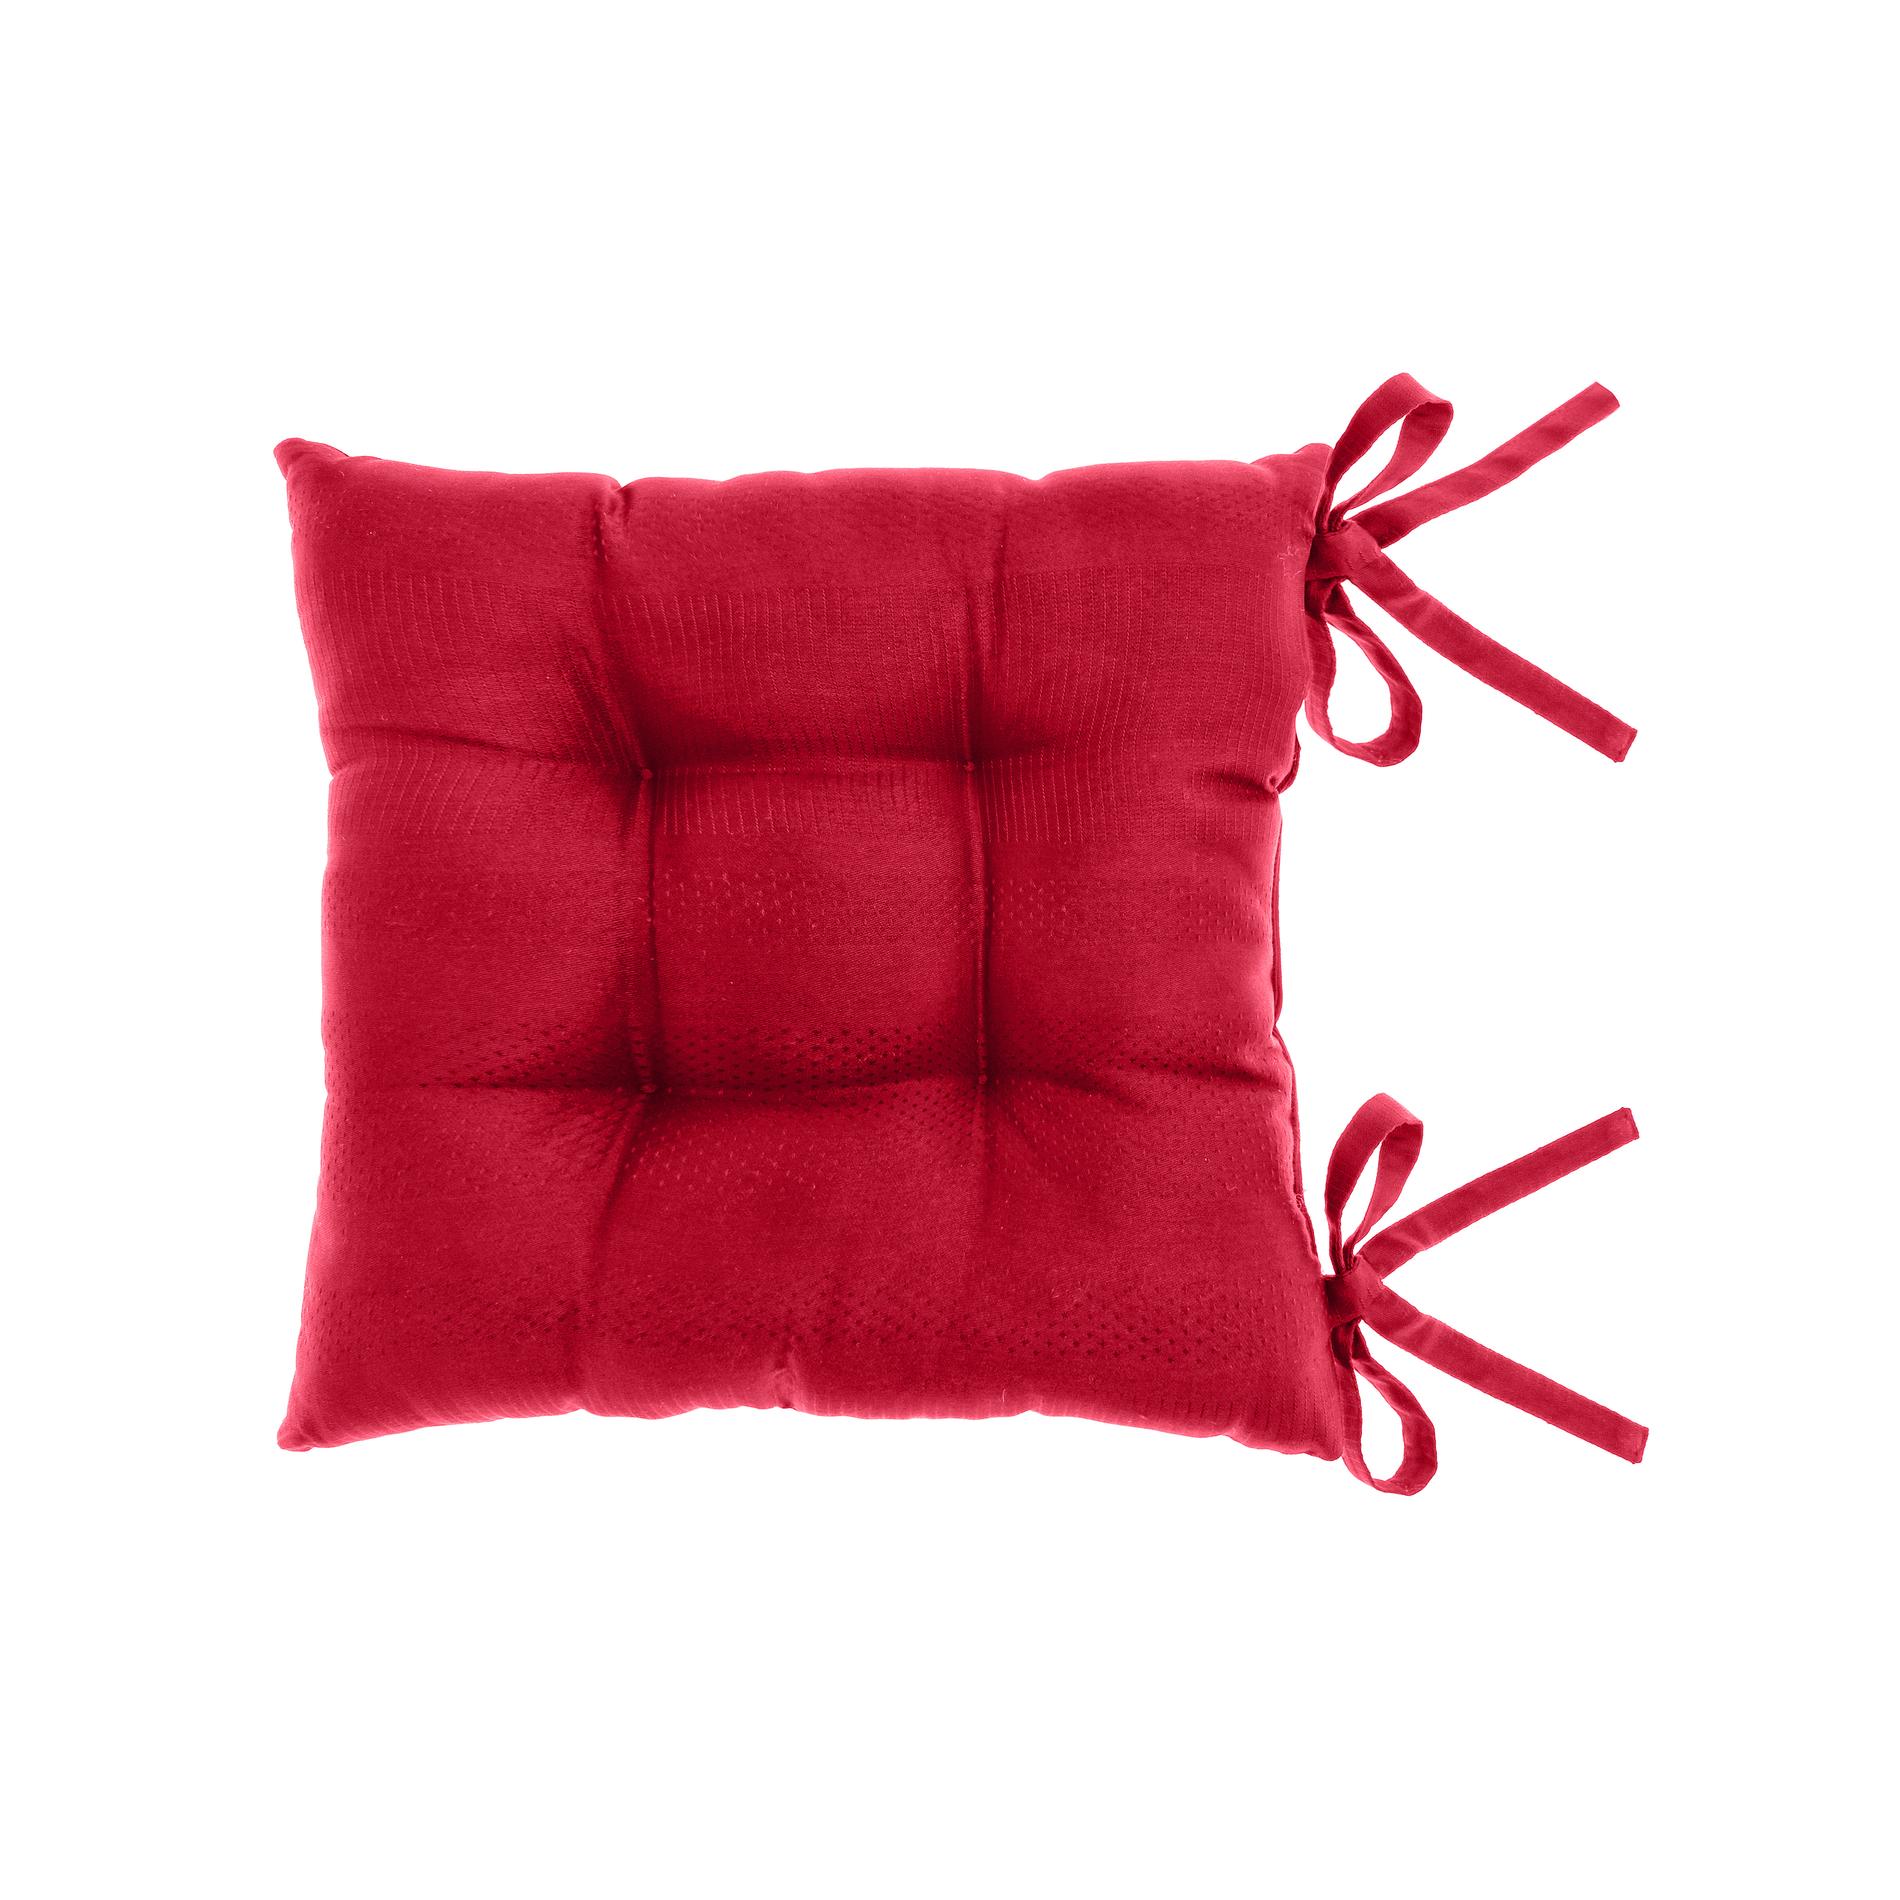 Cuscino sedia puro cotone egiziano jacquard Zefiro coincasa